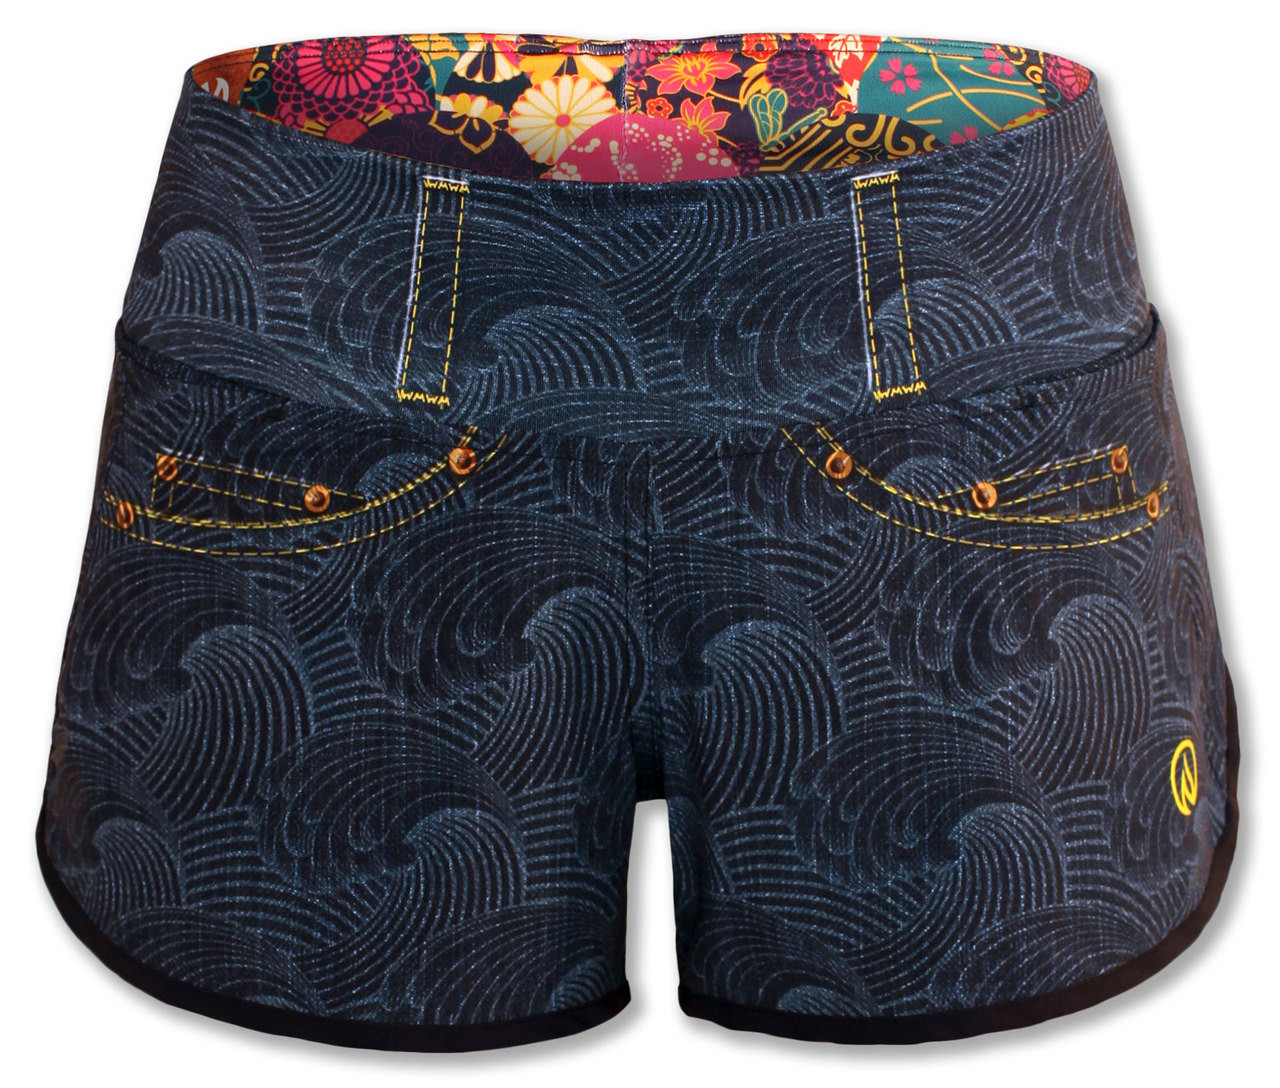 INKnBURN Women's Wave Denim Shorts Front